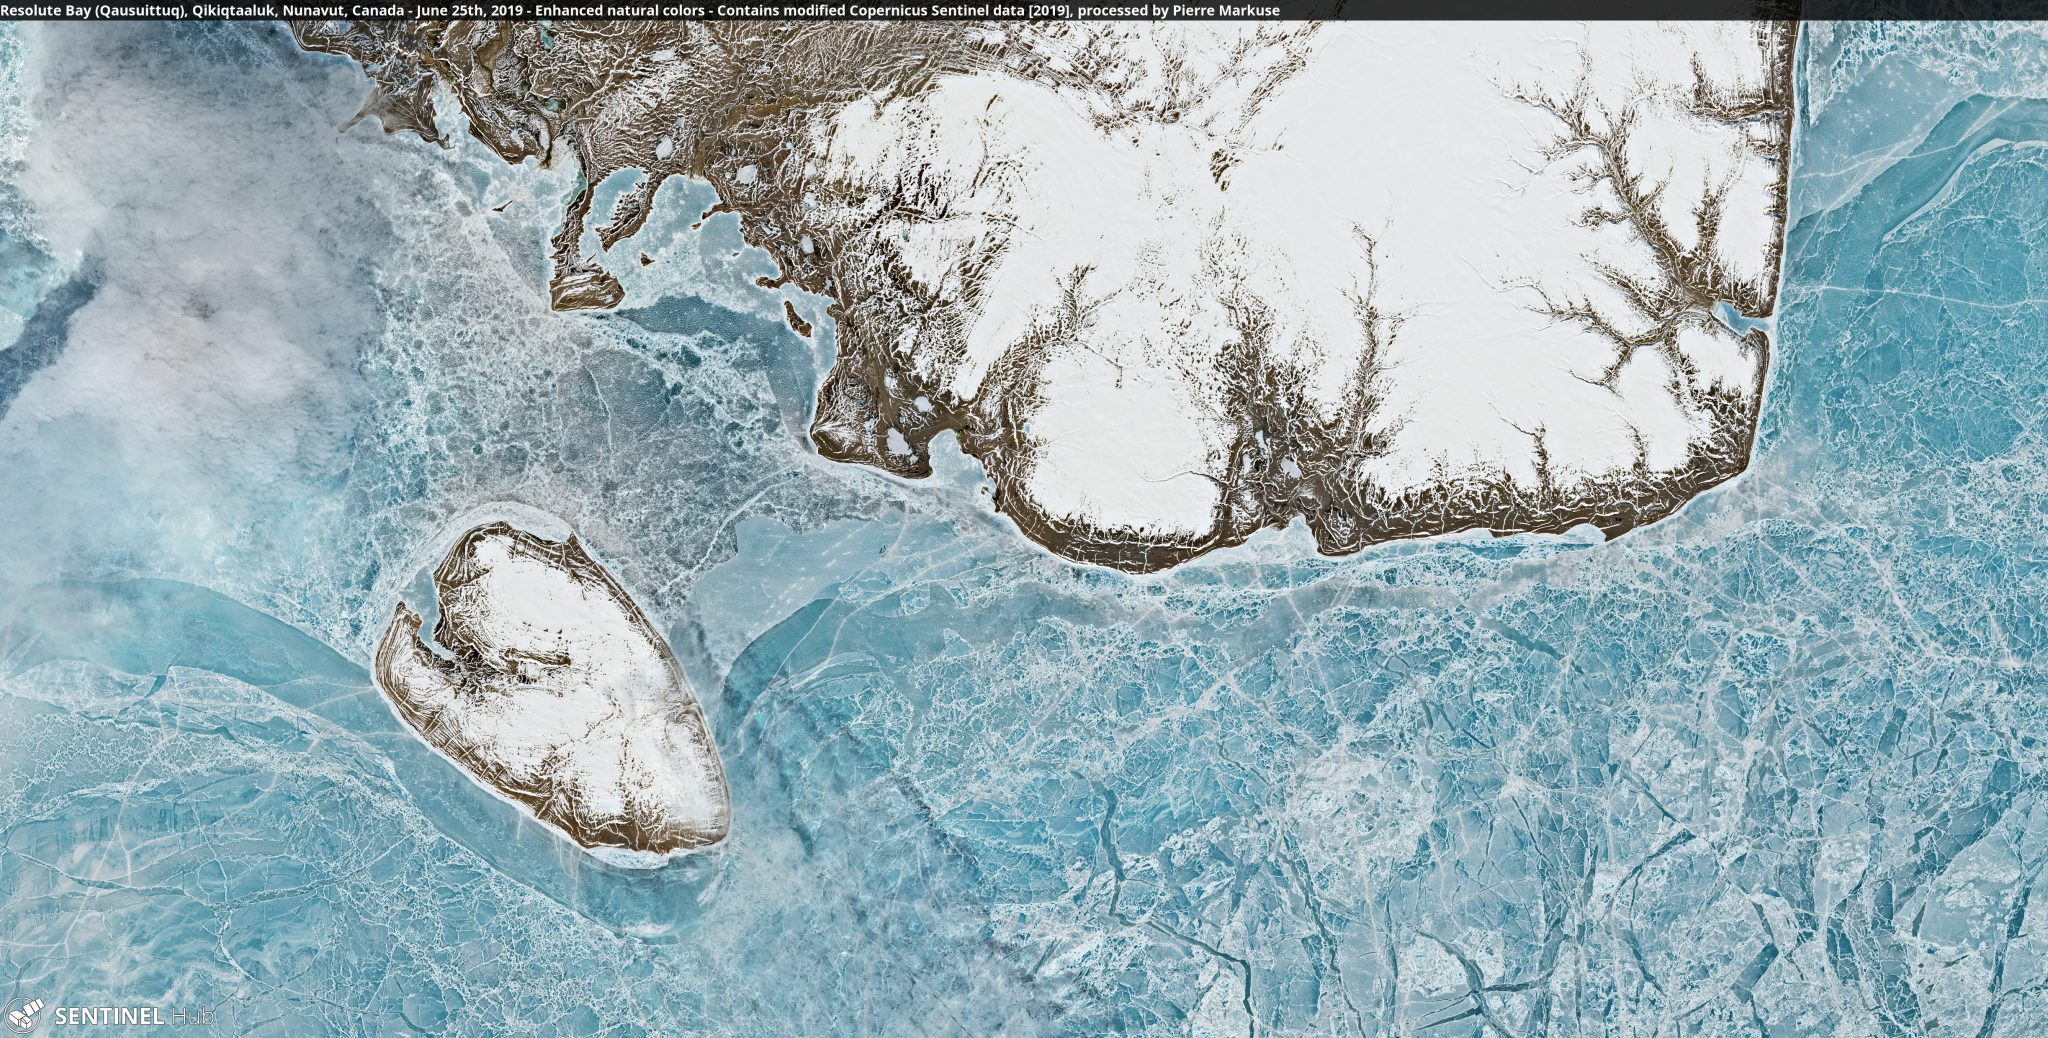 desc:Resolute Bay (Qausuittuq), Qikiqtaaluk, Nunavut, Canada Copernicus/Pierre Markuse